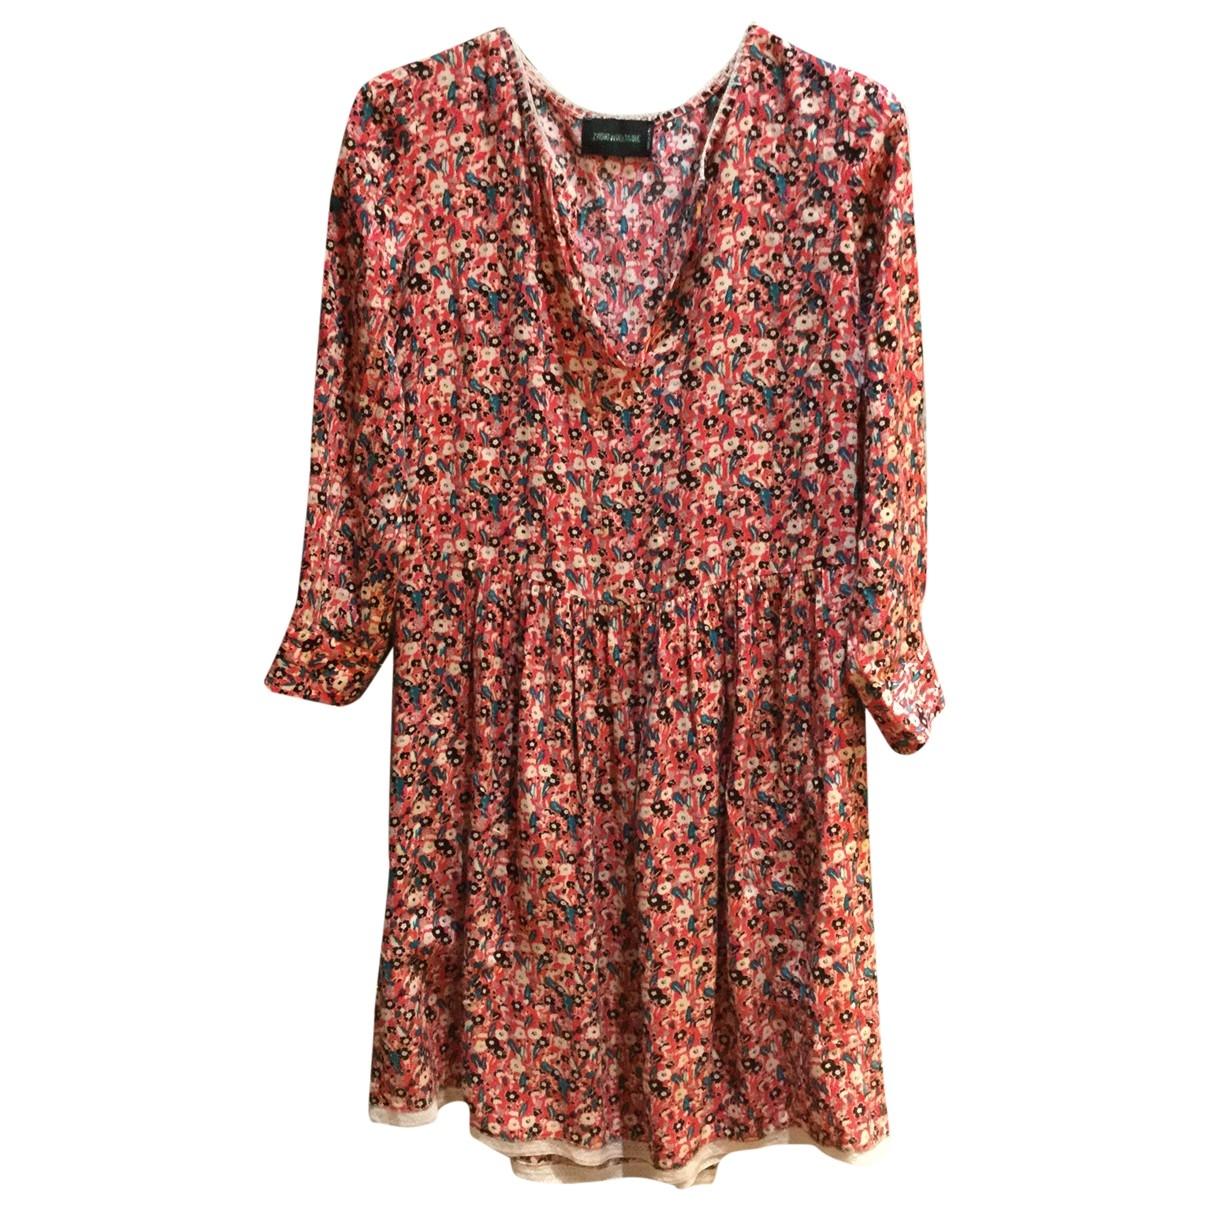 Zadig & Voltaire \N Multicolour dress for Women M International